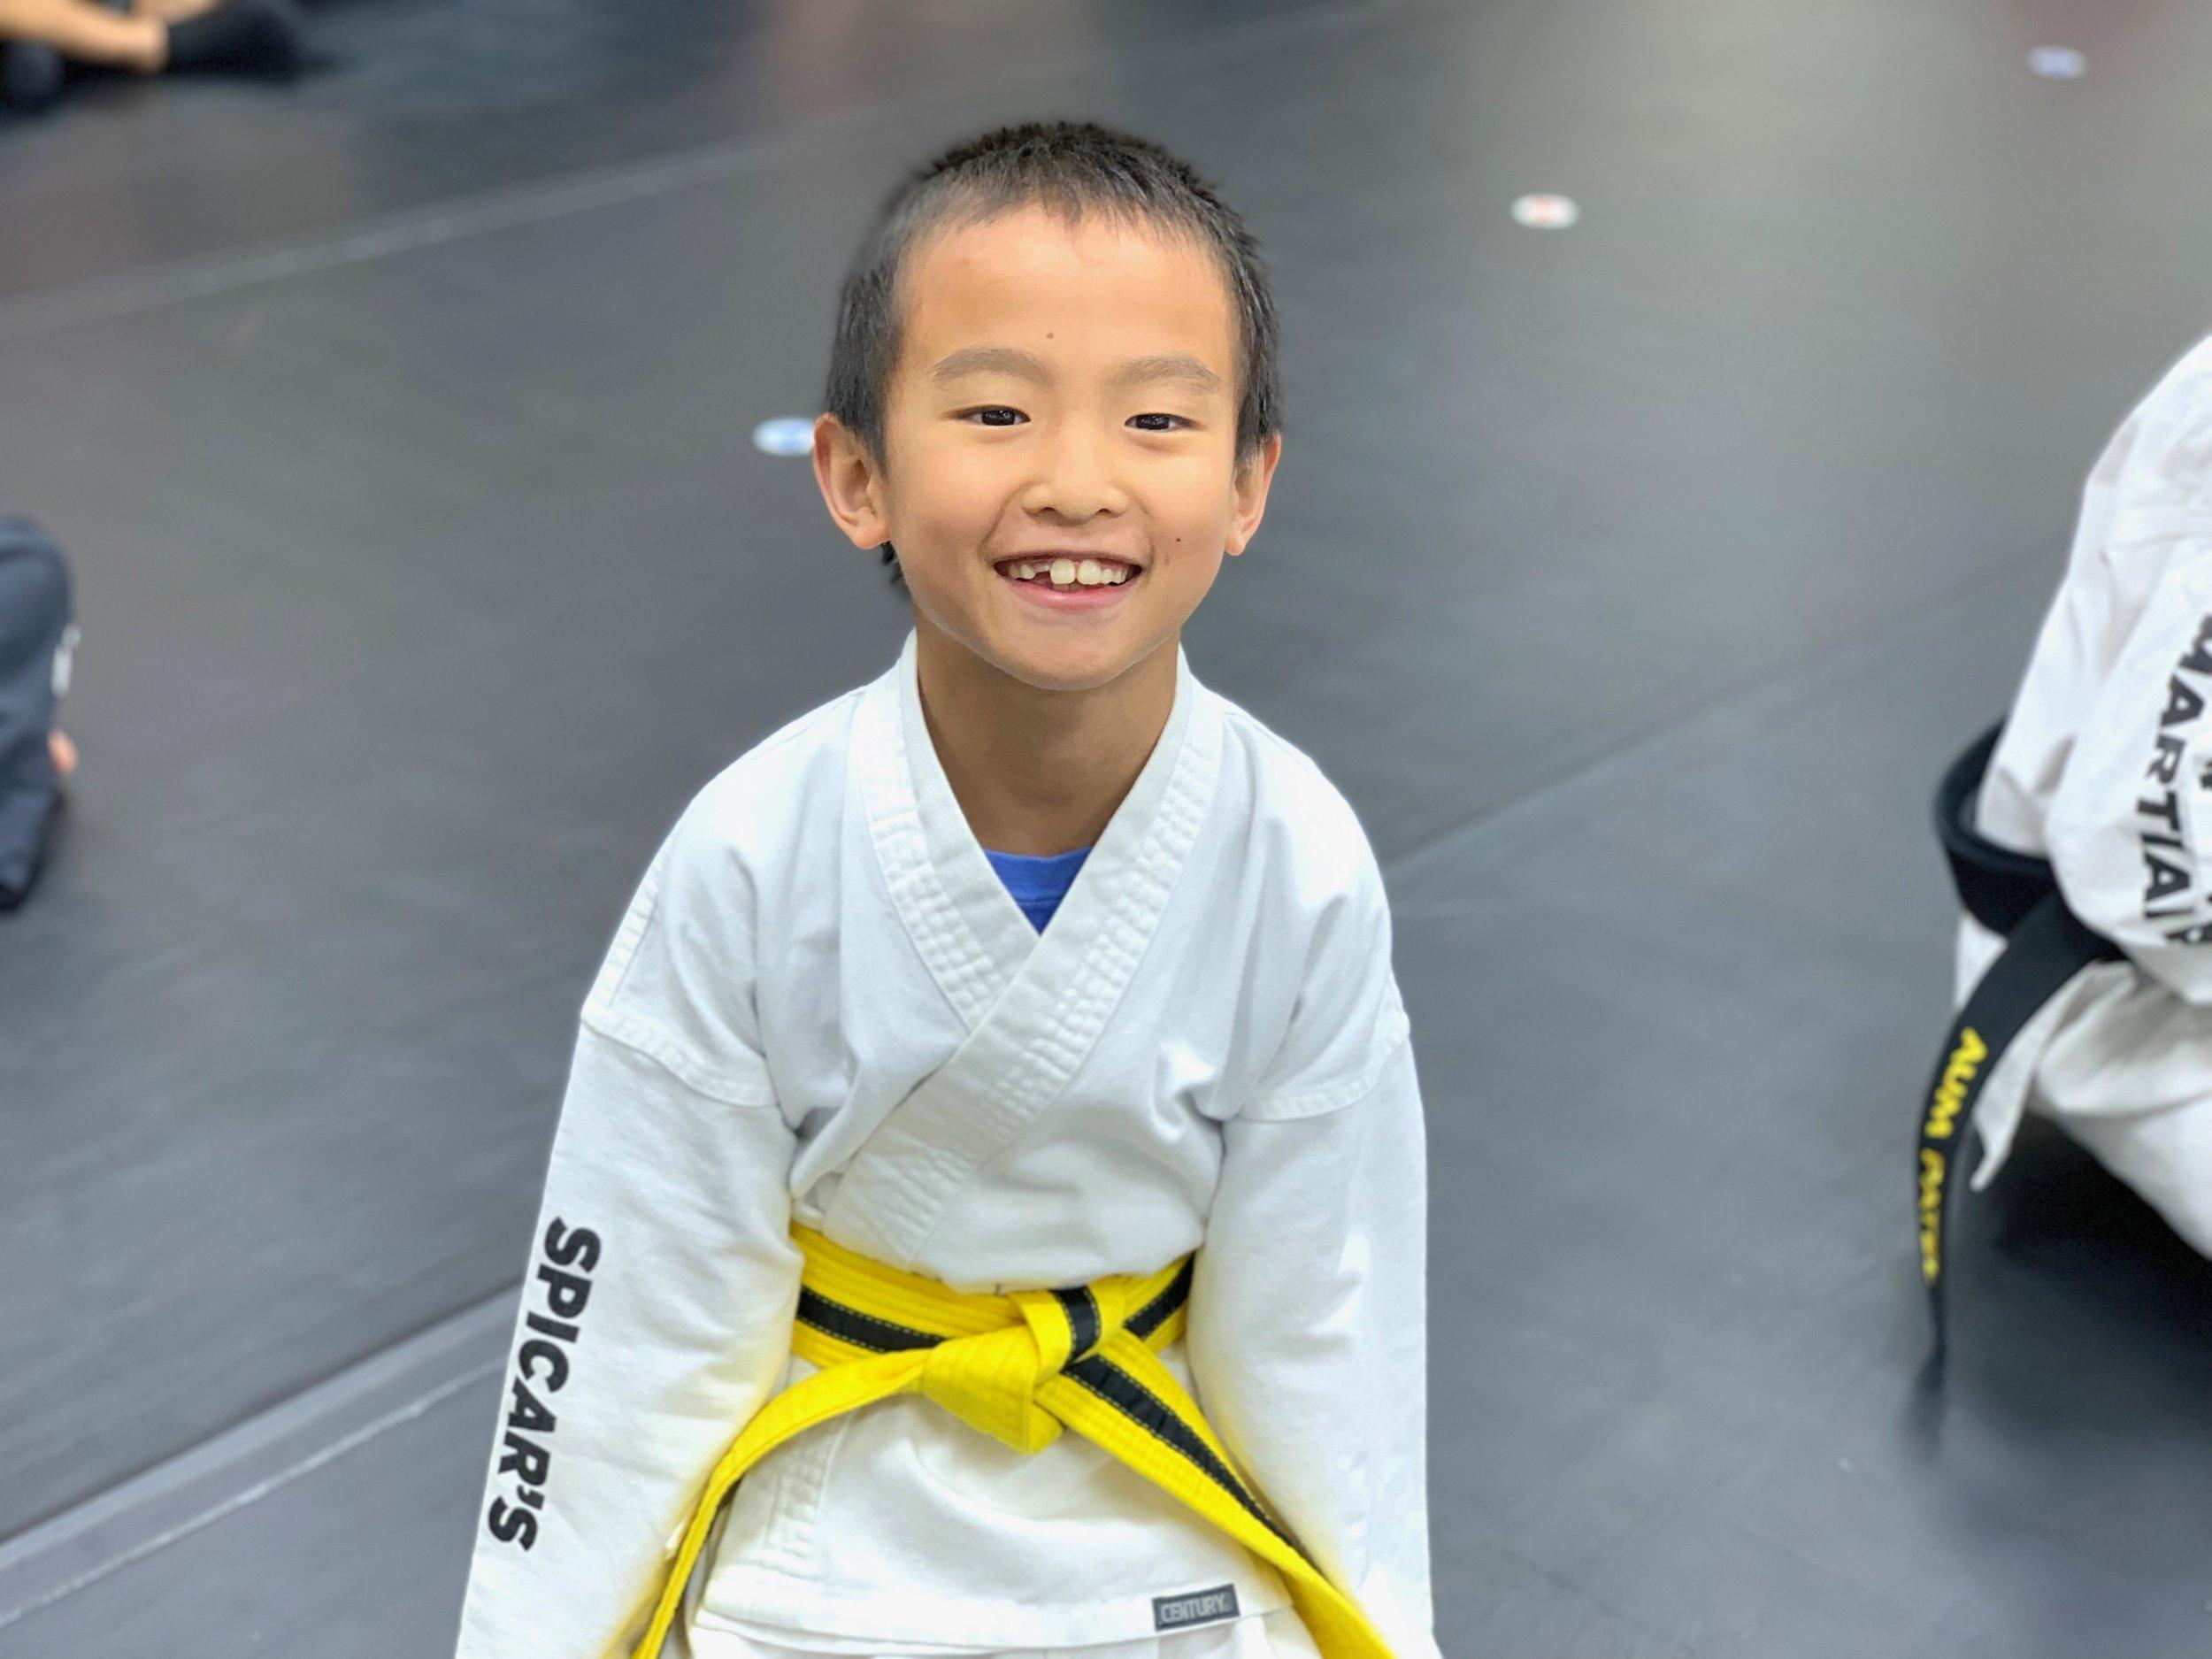 karate-kids-program-souhtlake-keller-grapevine-texas00010.jpeg